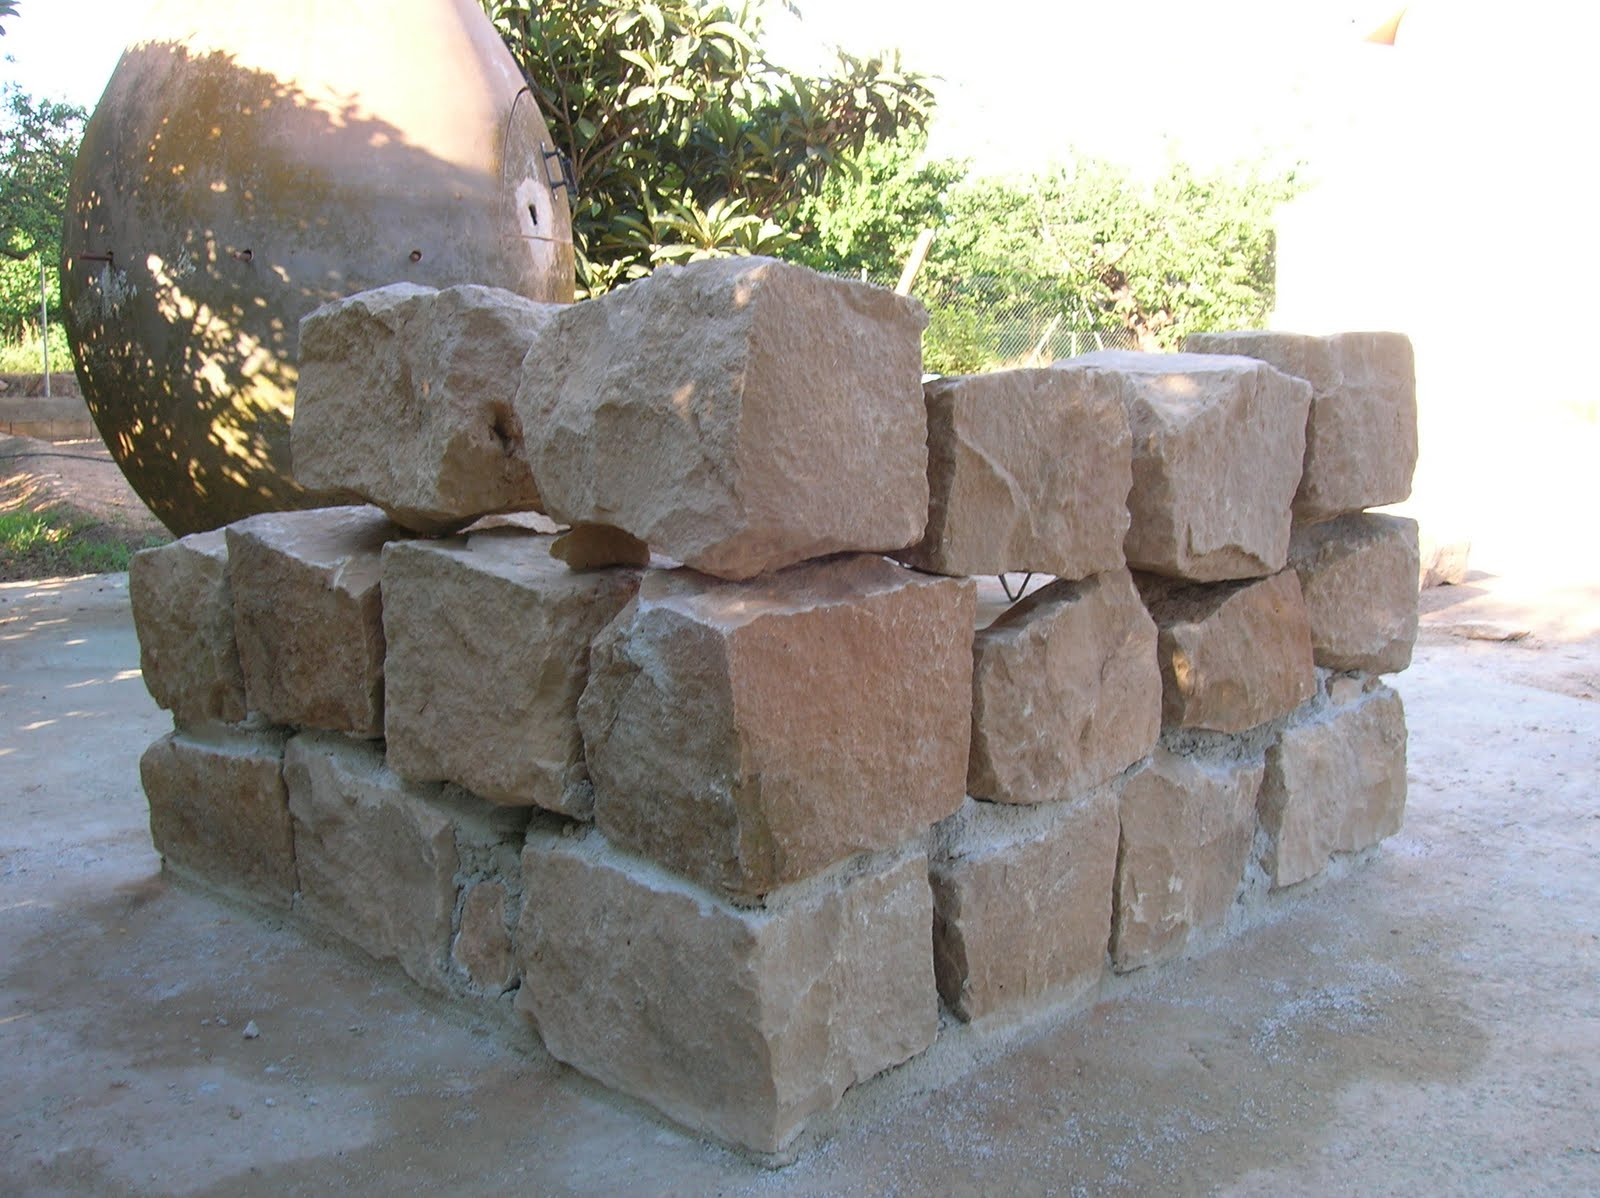 Mundocharly construccion de un horno de le a capitulo - Horno de piedra casero ...